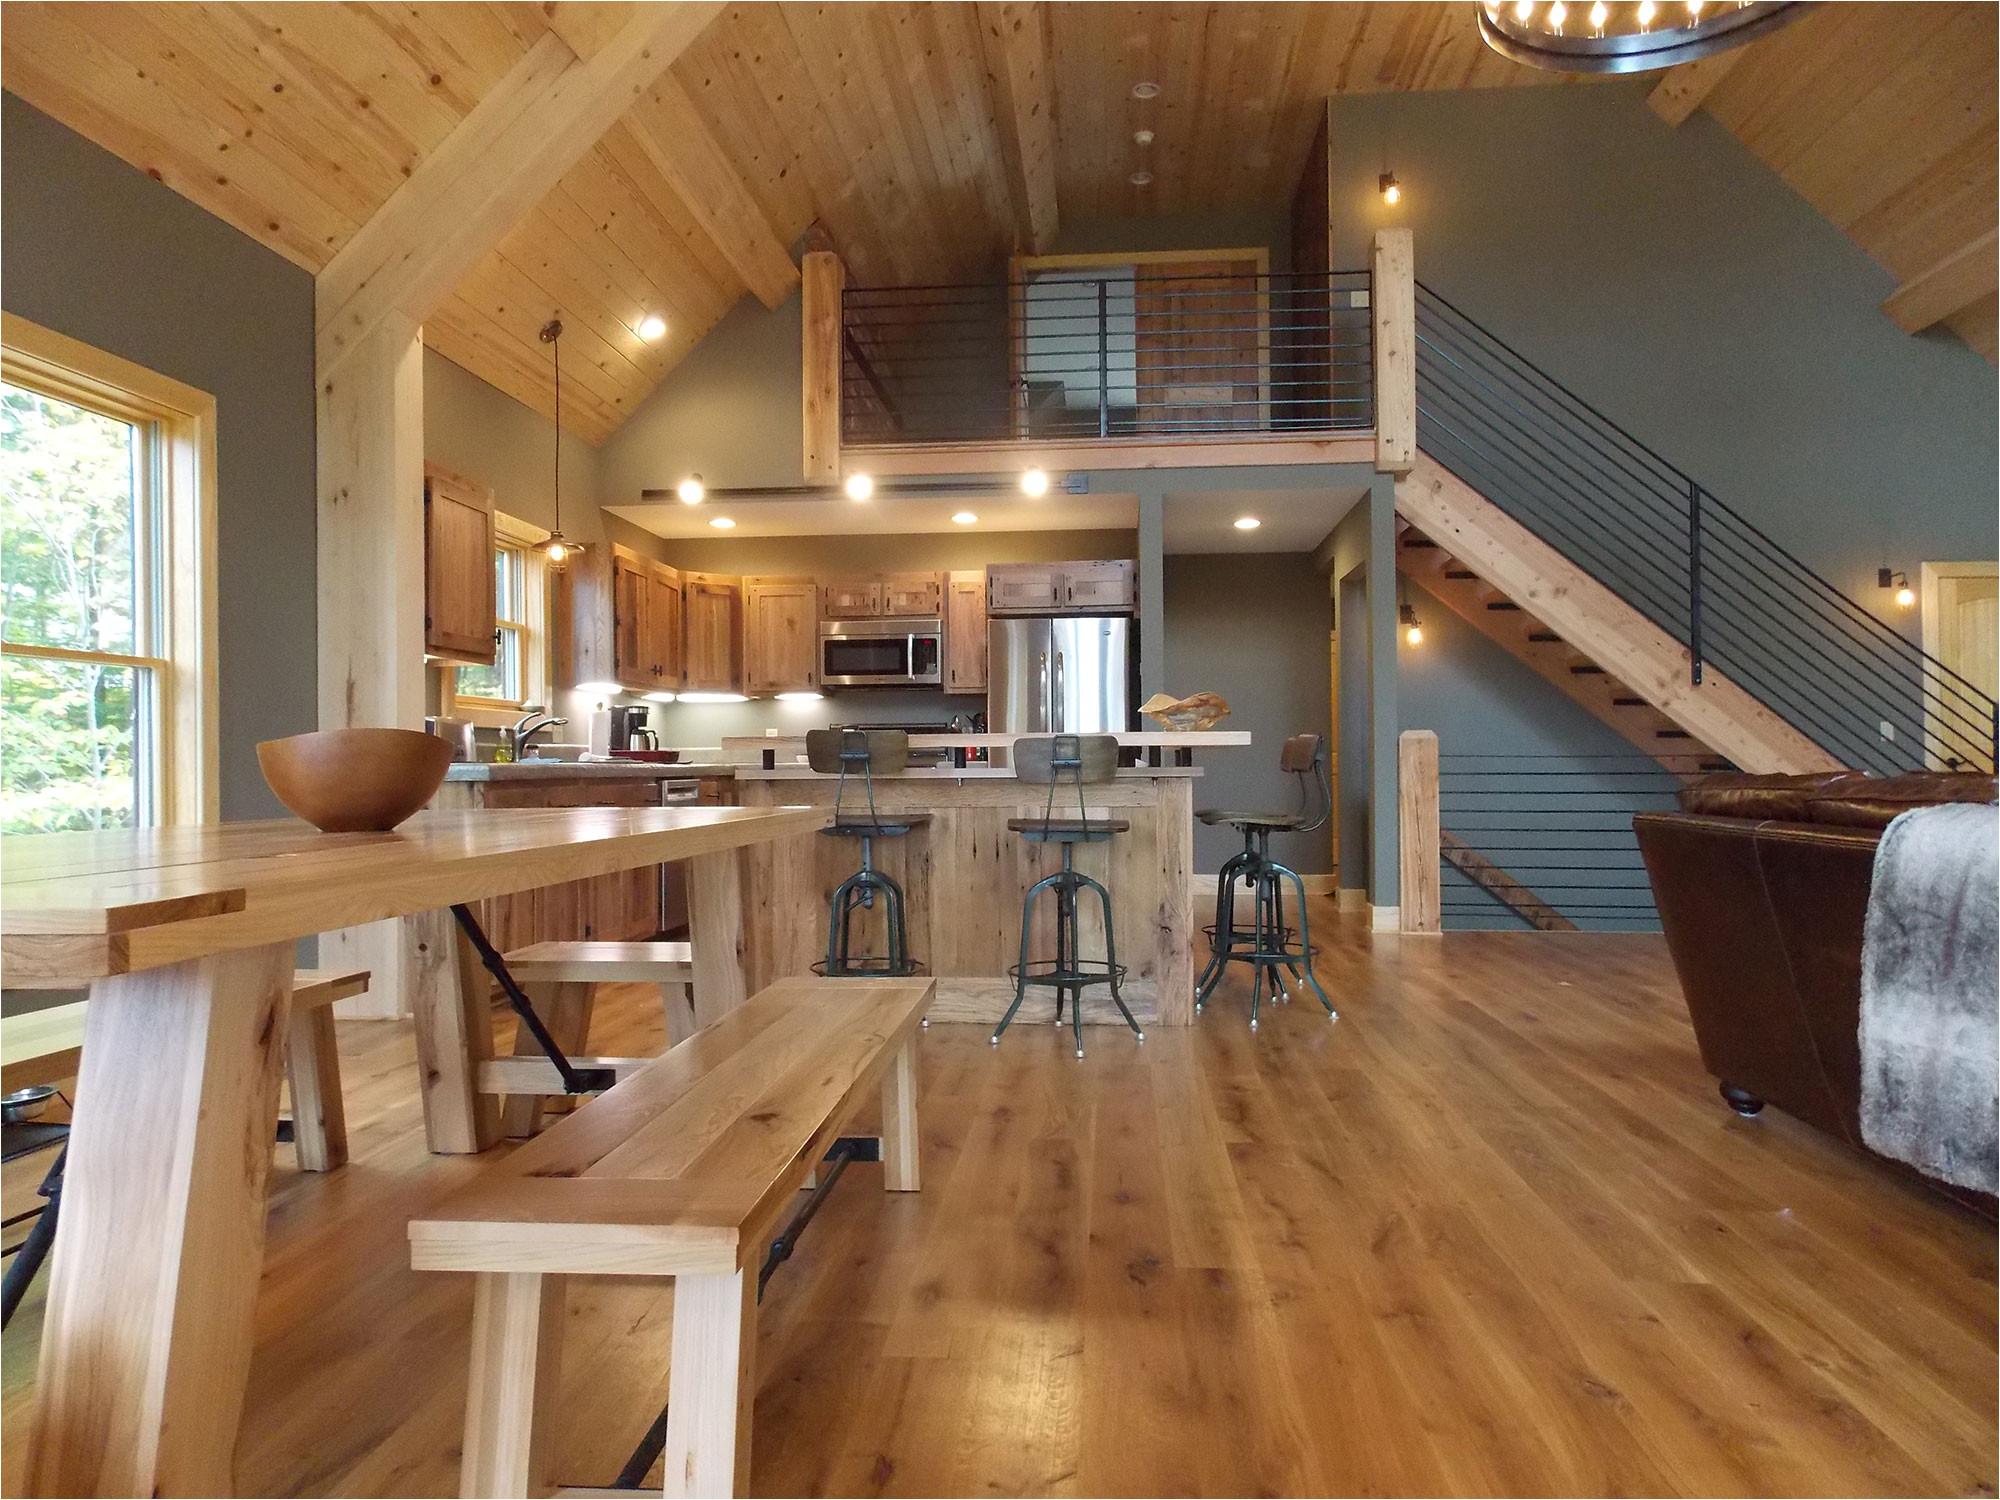 photos of small cabin interiors